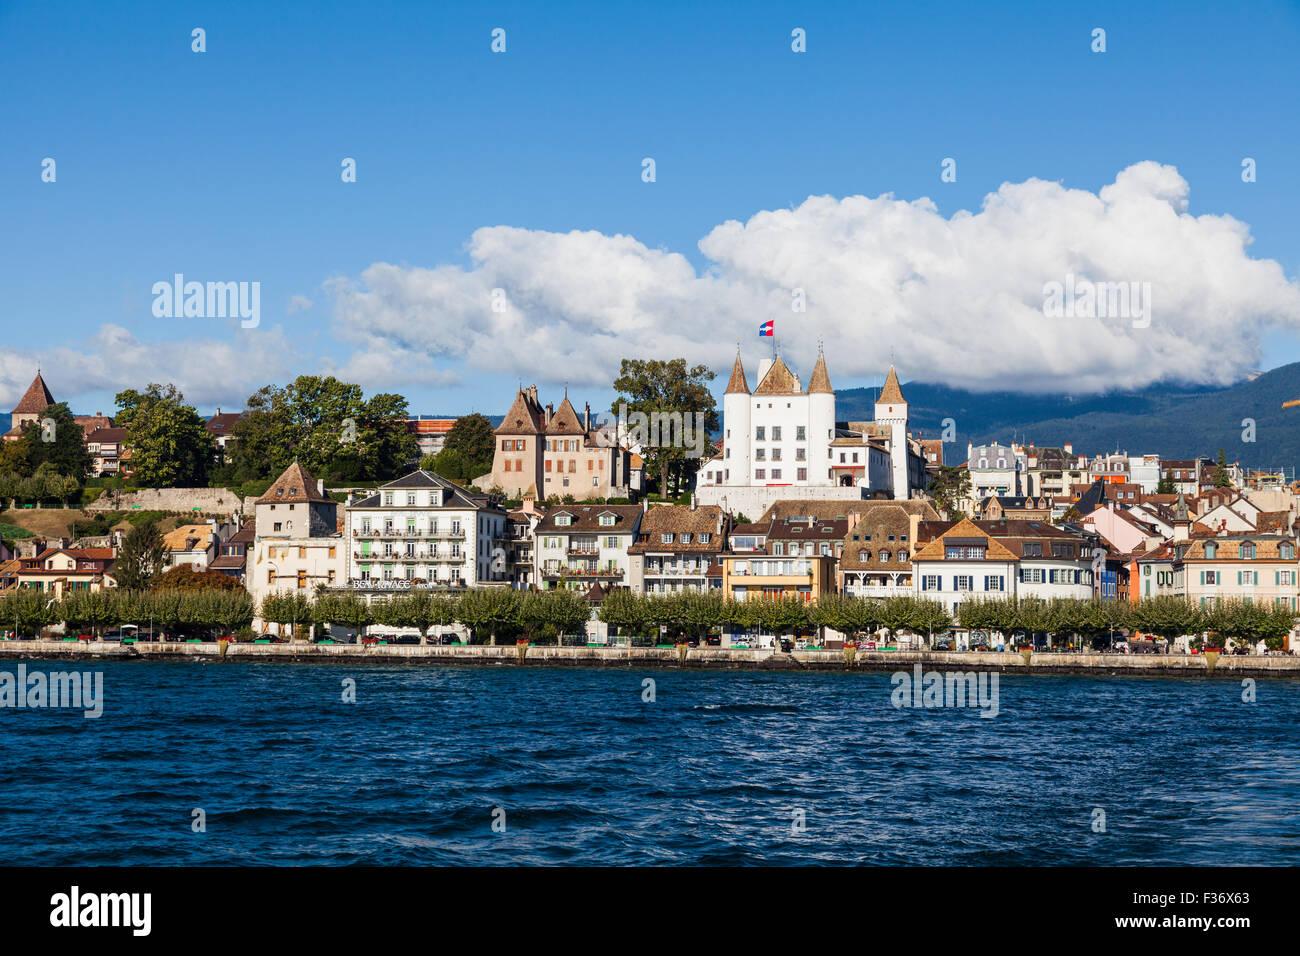 Waterfront view of the town of Nyon on Lake Geneva, Switzerland - Stock Image